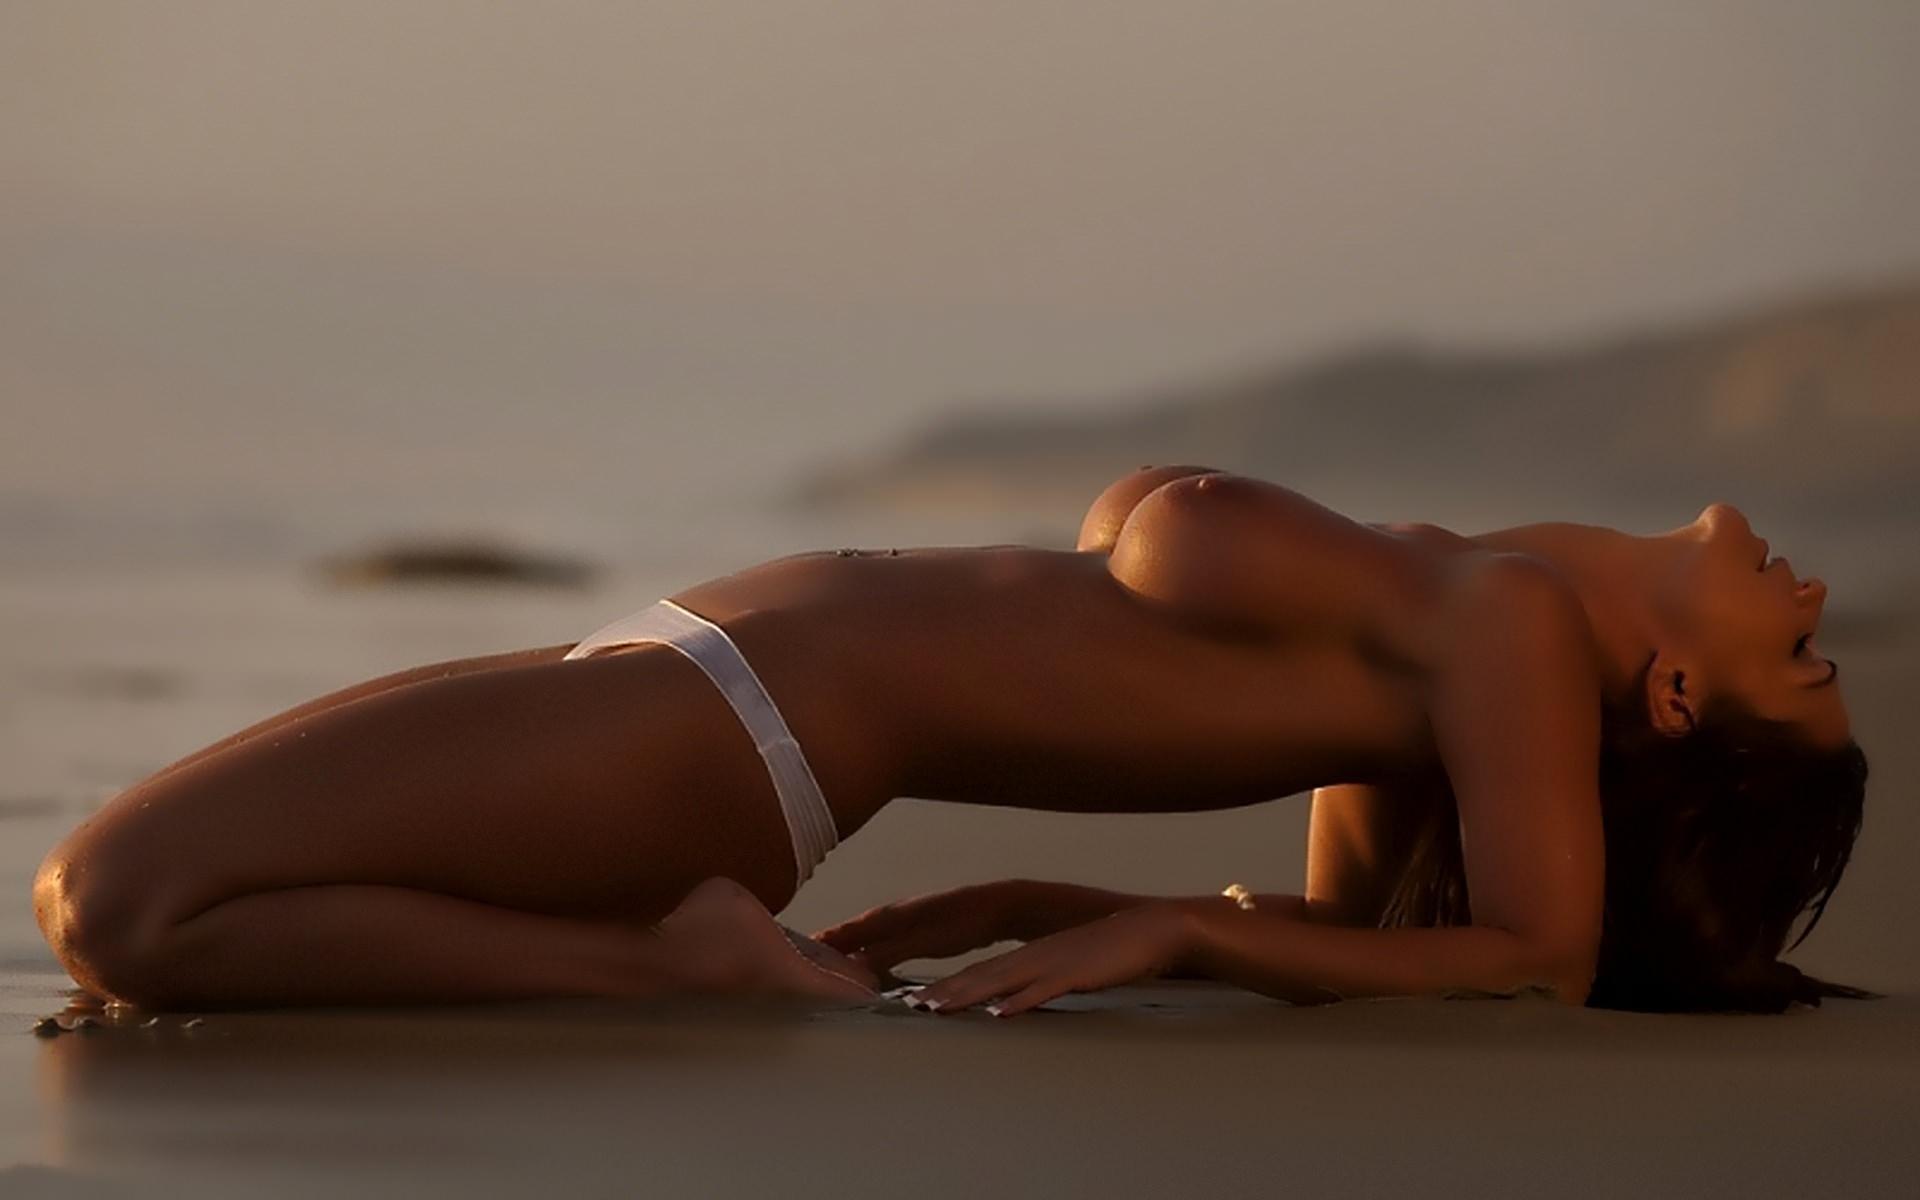 Фото эротических девчонок на закате 20 фотография